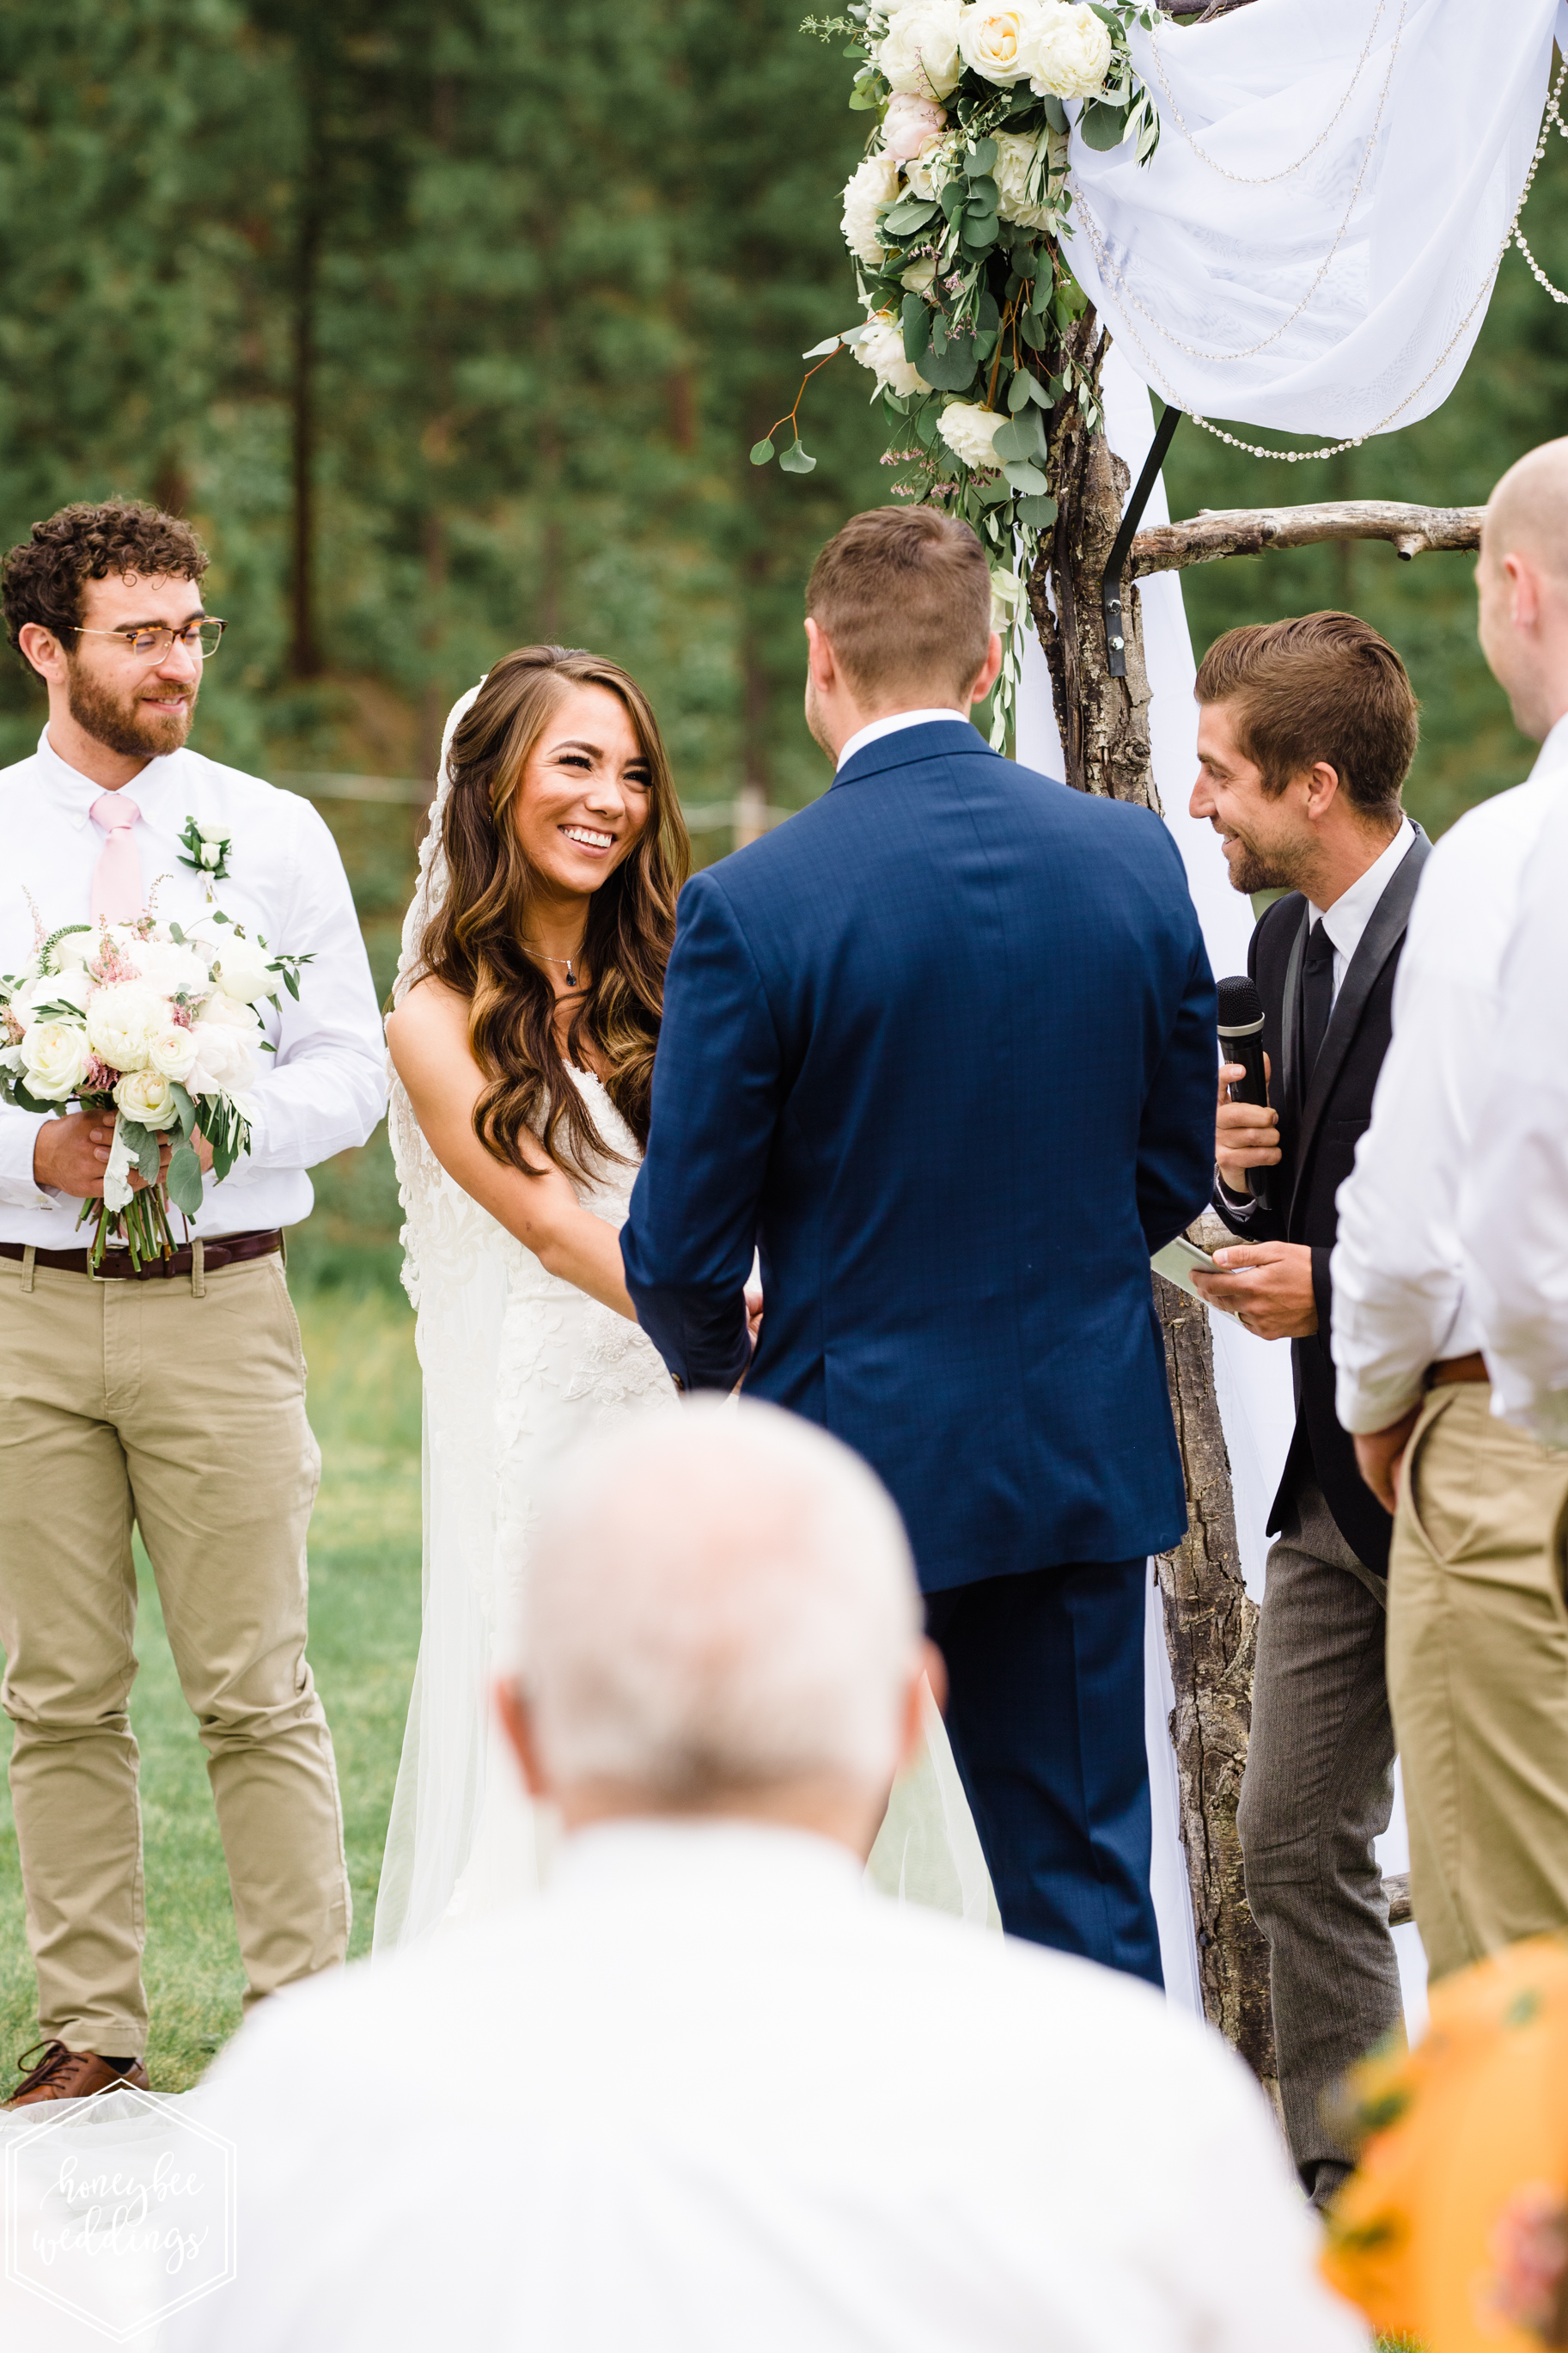 057Montana Wedding Photographer_Missoula Wedding_Honeybee Weddings_Devlin & Jacob_June 22, 2019-1621.jpg